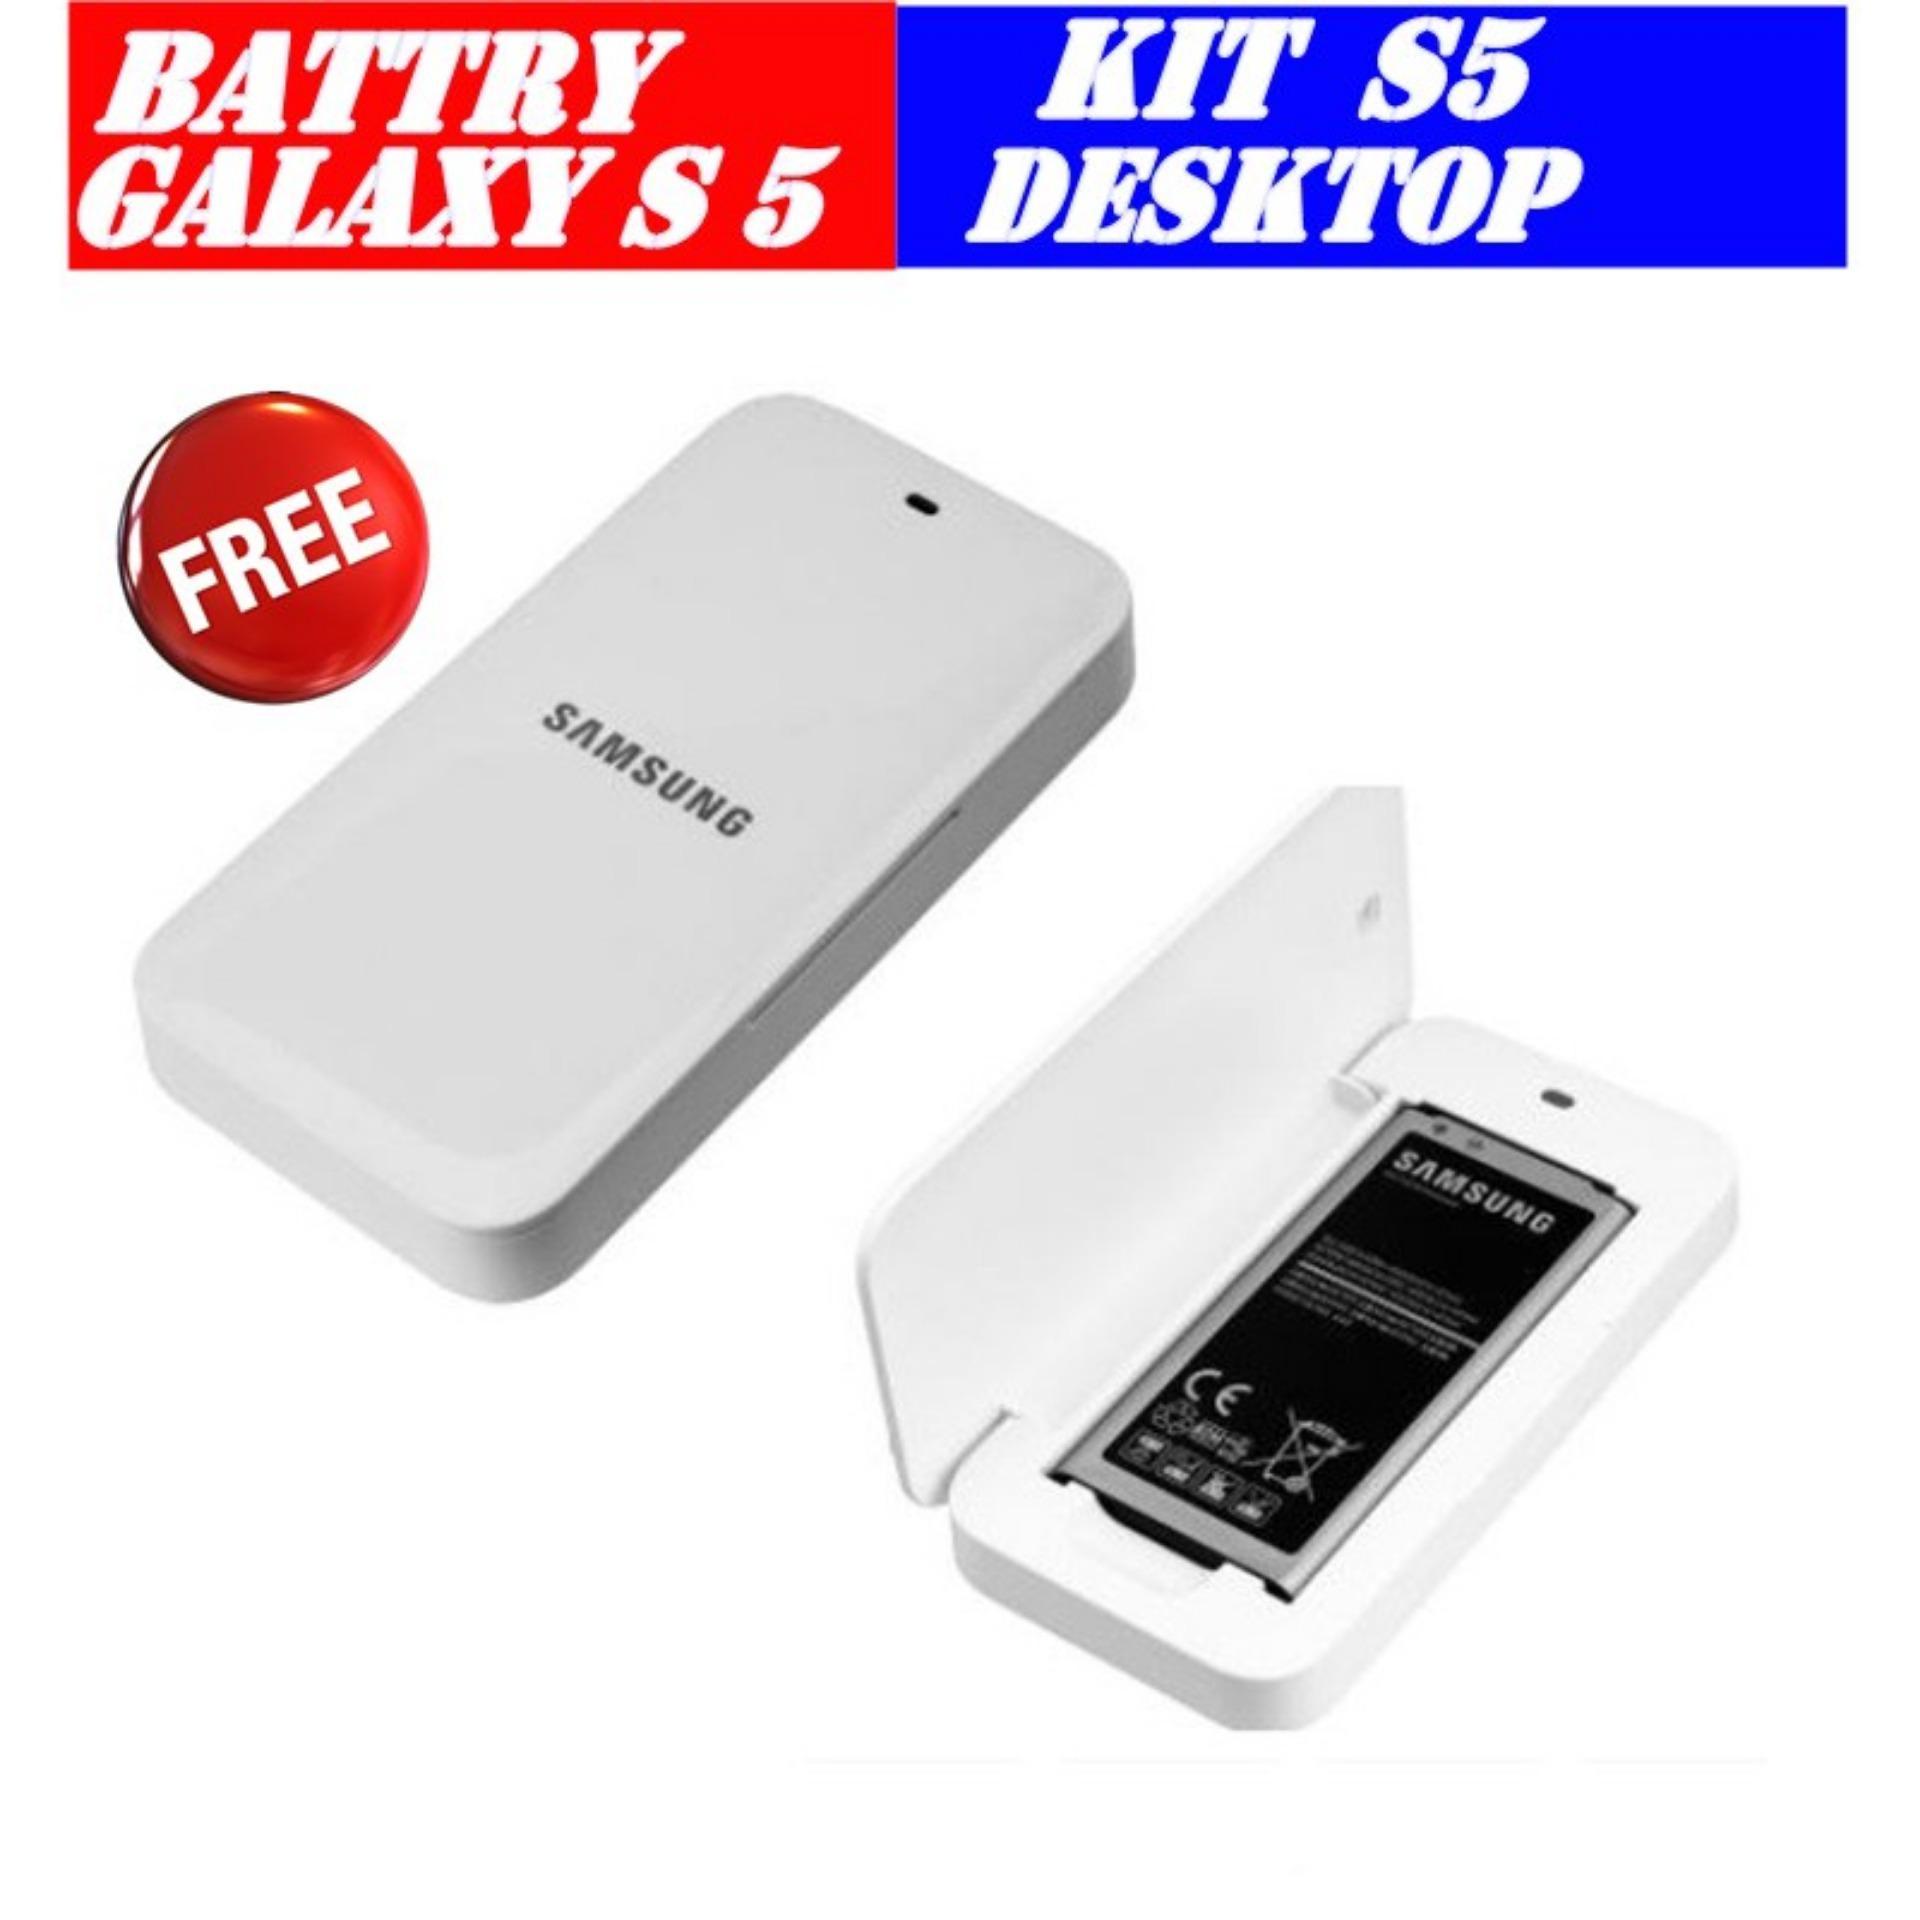 Promo Toko Samsung Extra Battery Kit For S5 Gratis Samsung Battery 2800Mah